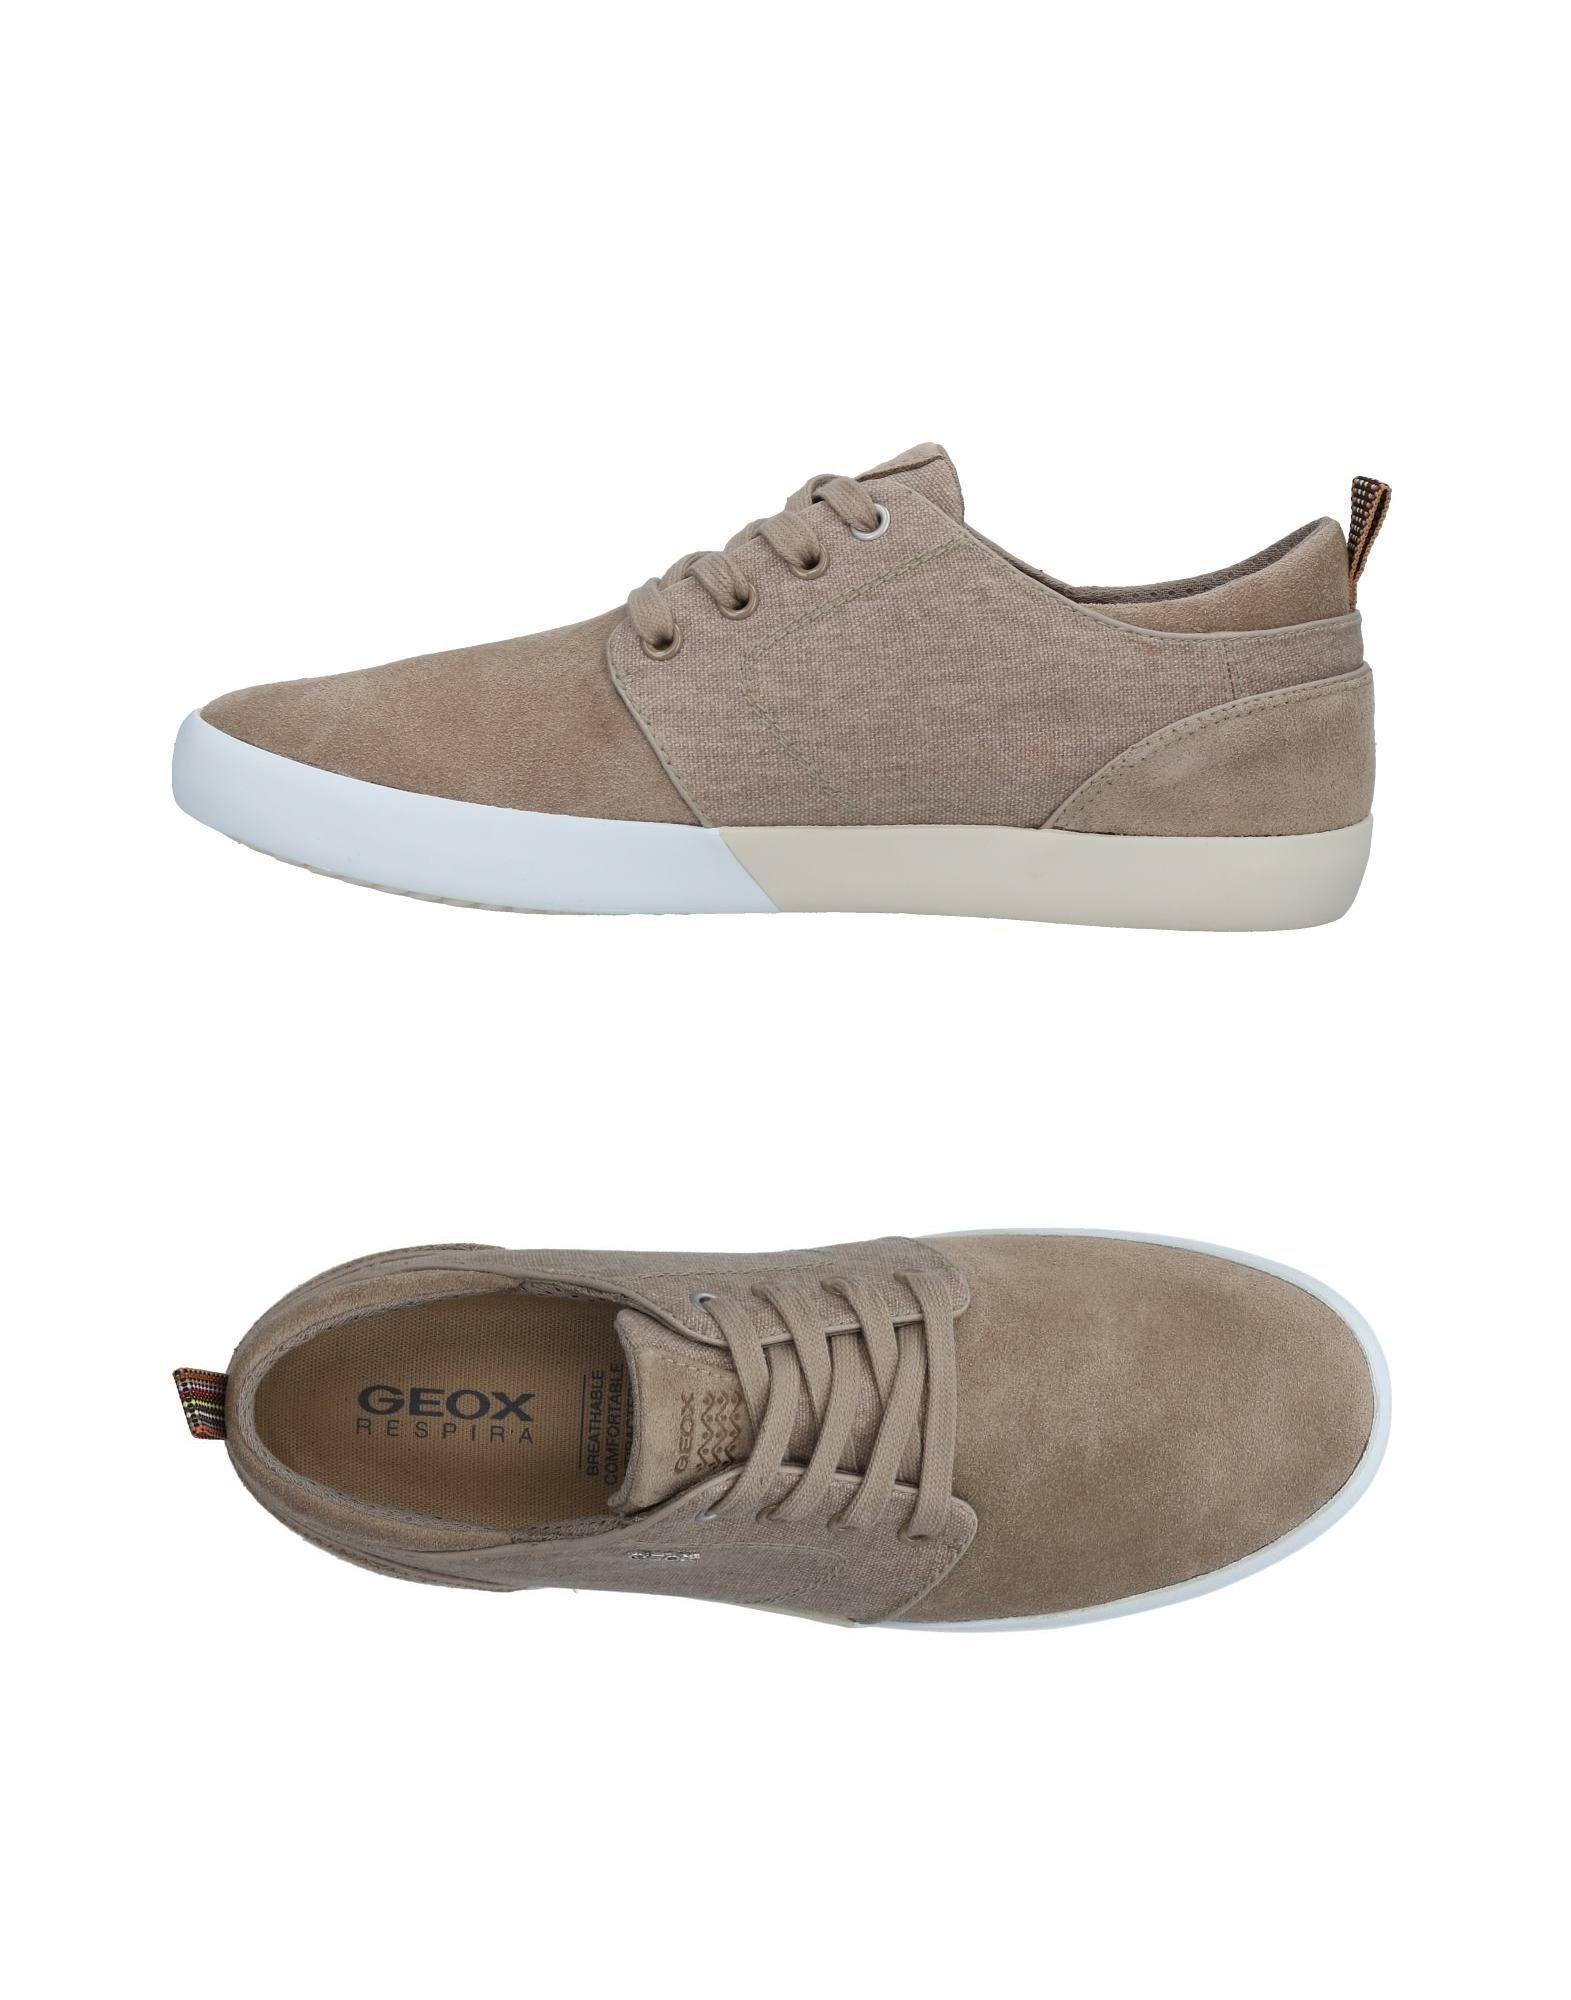 Sneakers Geox Homme - Sneakers Geox  Sable Meilleur modèle de vente